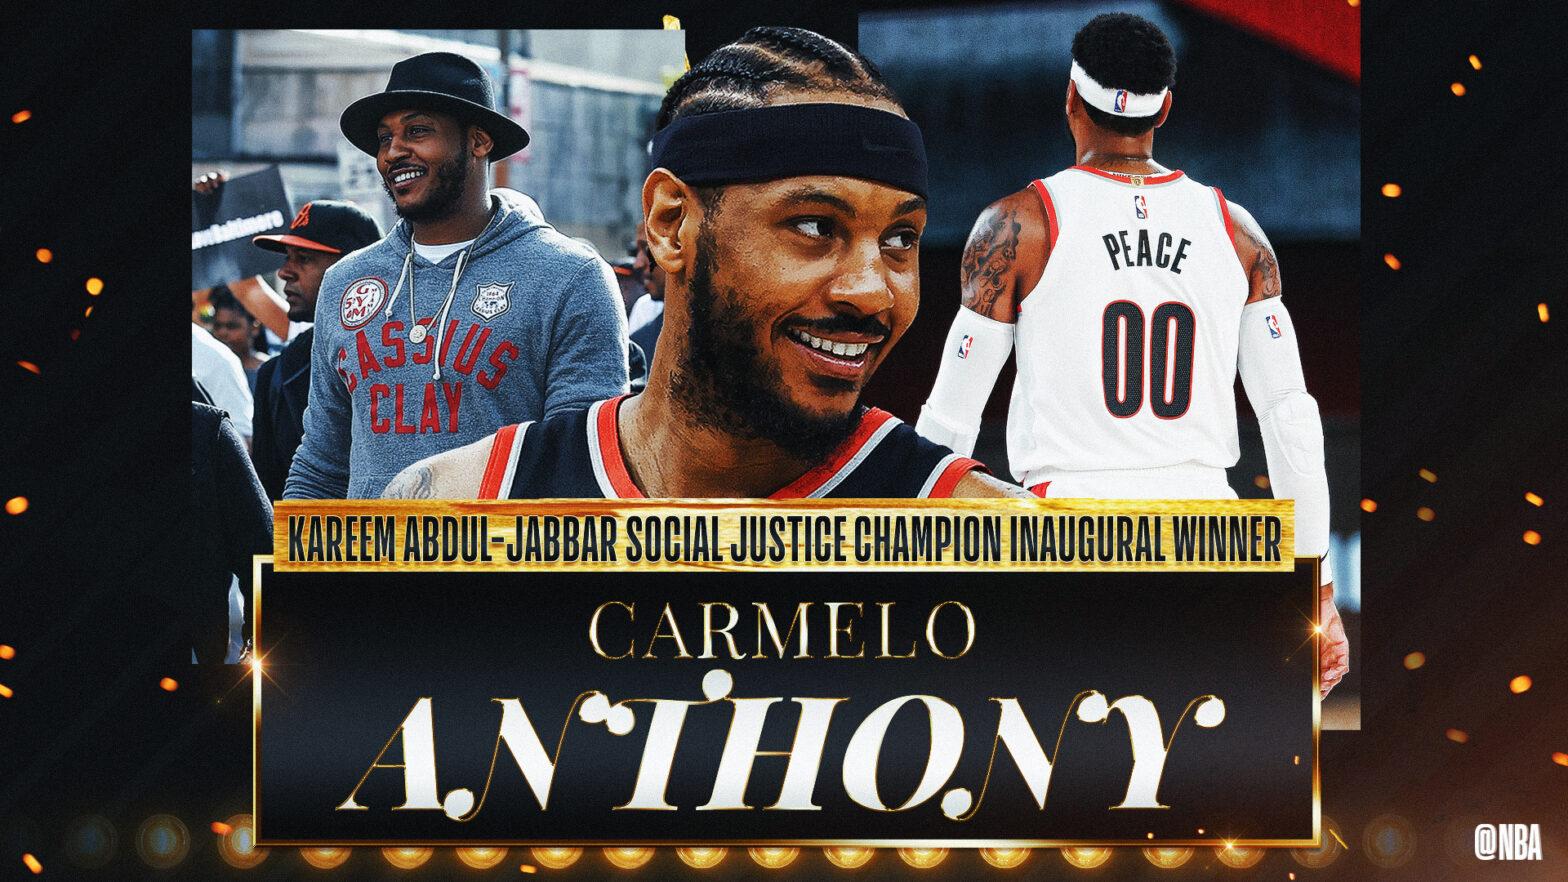 Carmelo Anthony Kareem Abdul-Jabbar Social Justice Champion NBA Award